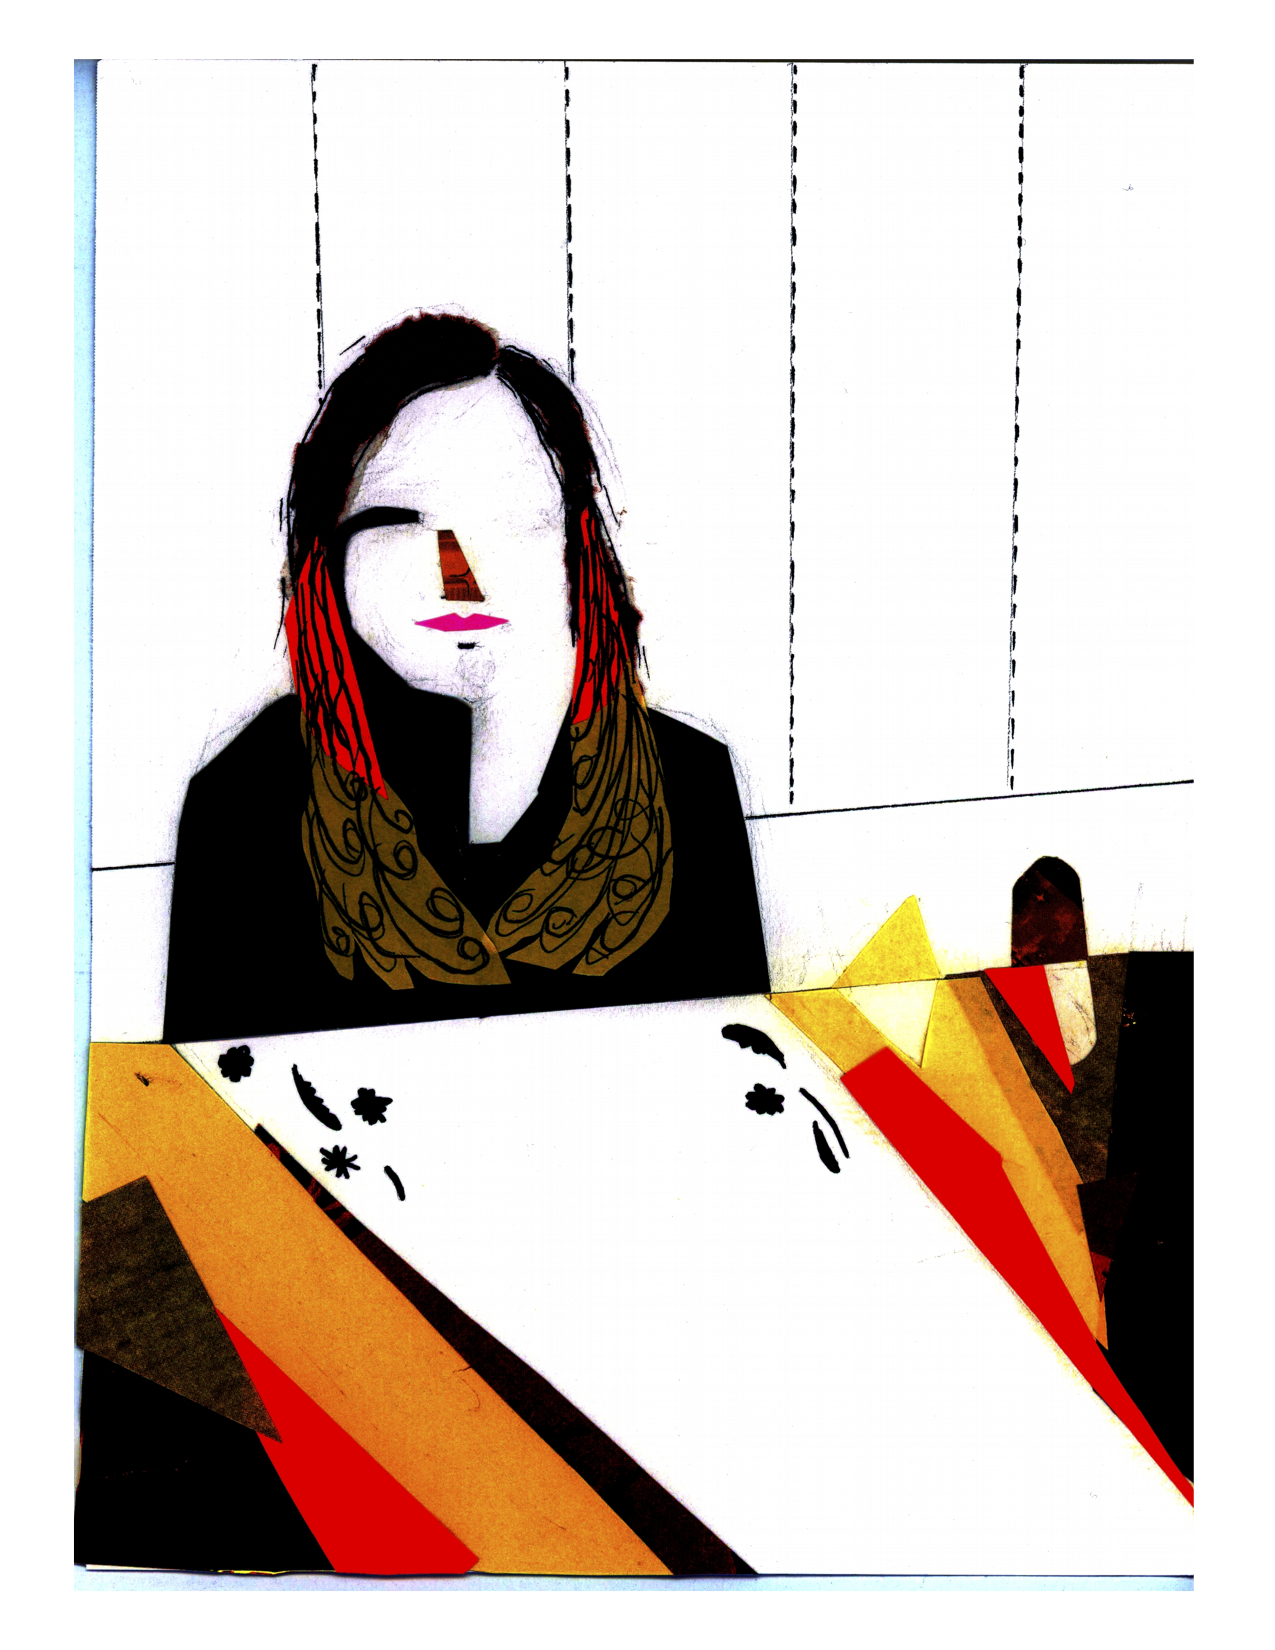 Ashley Shadow || Illustration by Alisa Lazear for Discorder Magazine